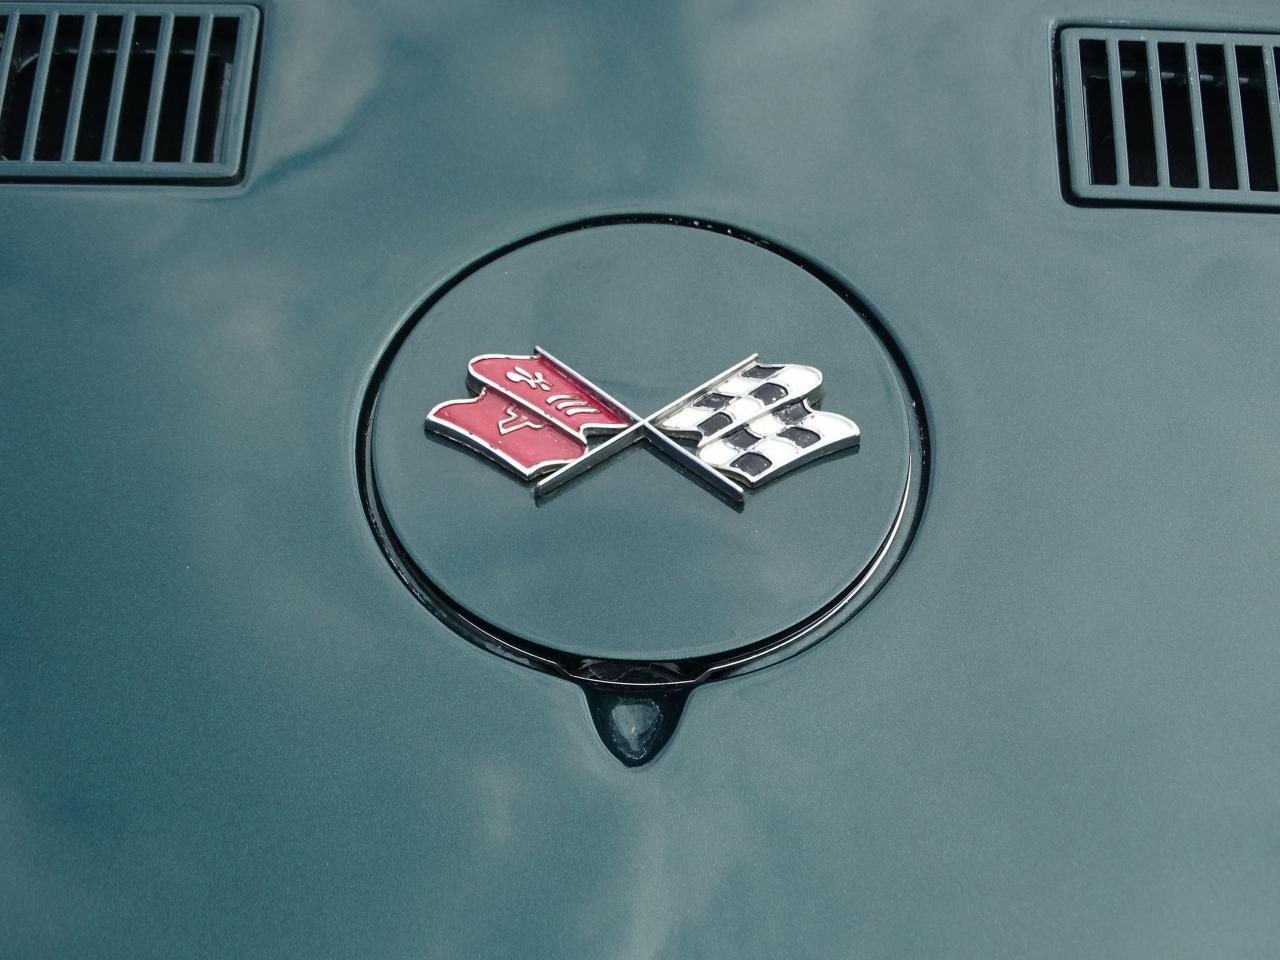 Large Picture of Classic '71 Chevrolet Corvette located in O'Fallon Illinois - $29,595.00 - LWIG